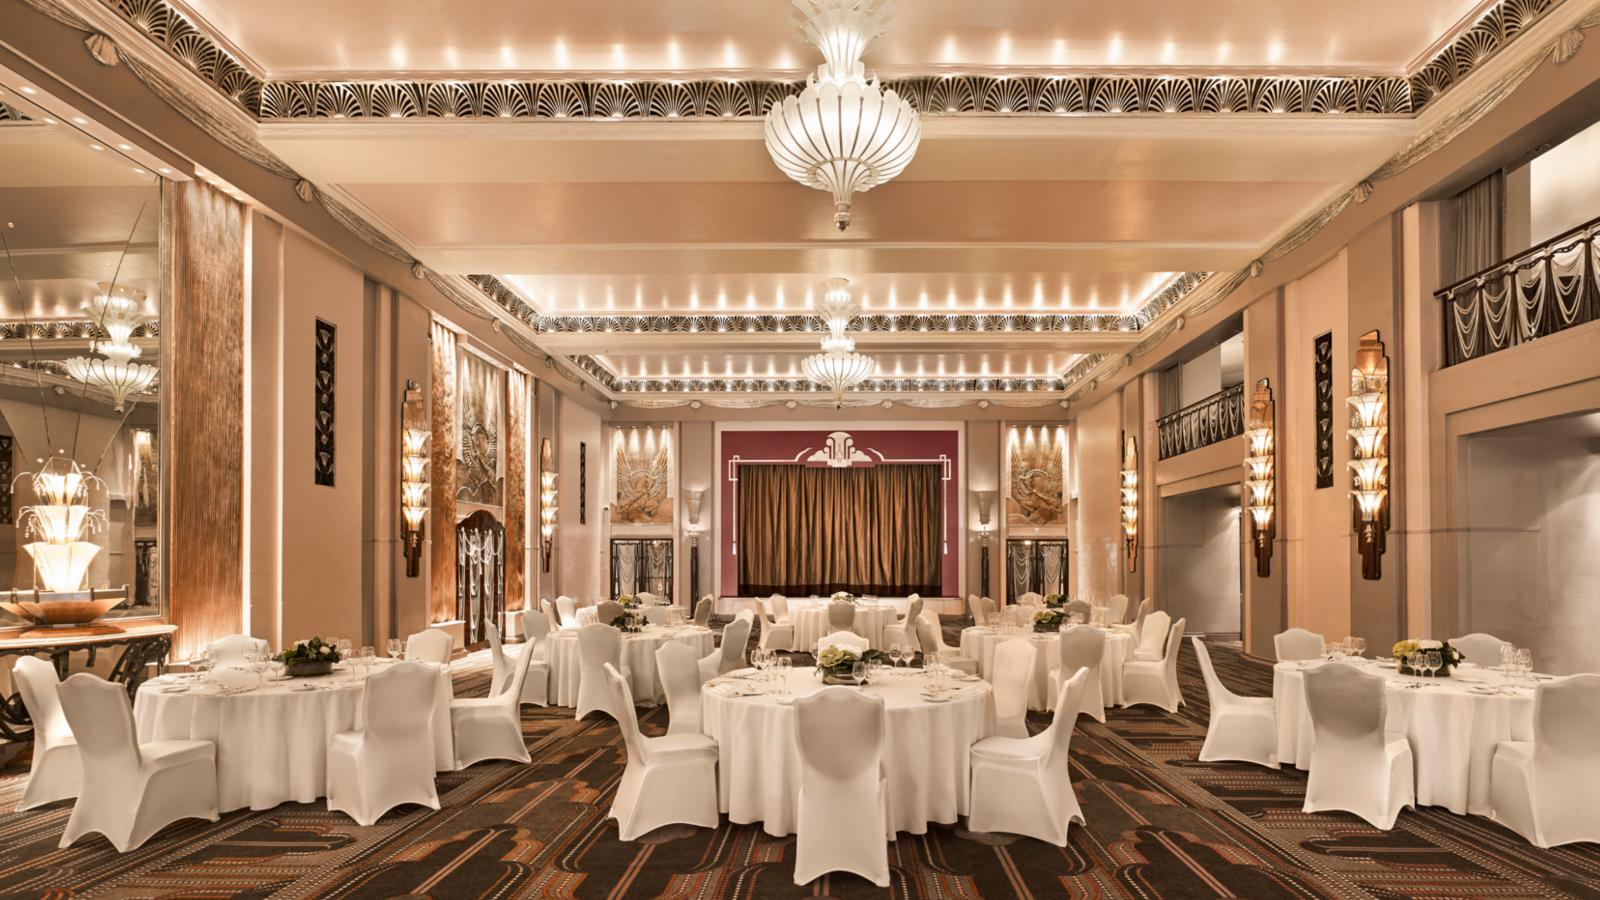 Ballroom-Sheraton-Park-Lane-Hotel-London-Piccadilly-Mayfair-5